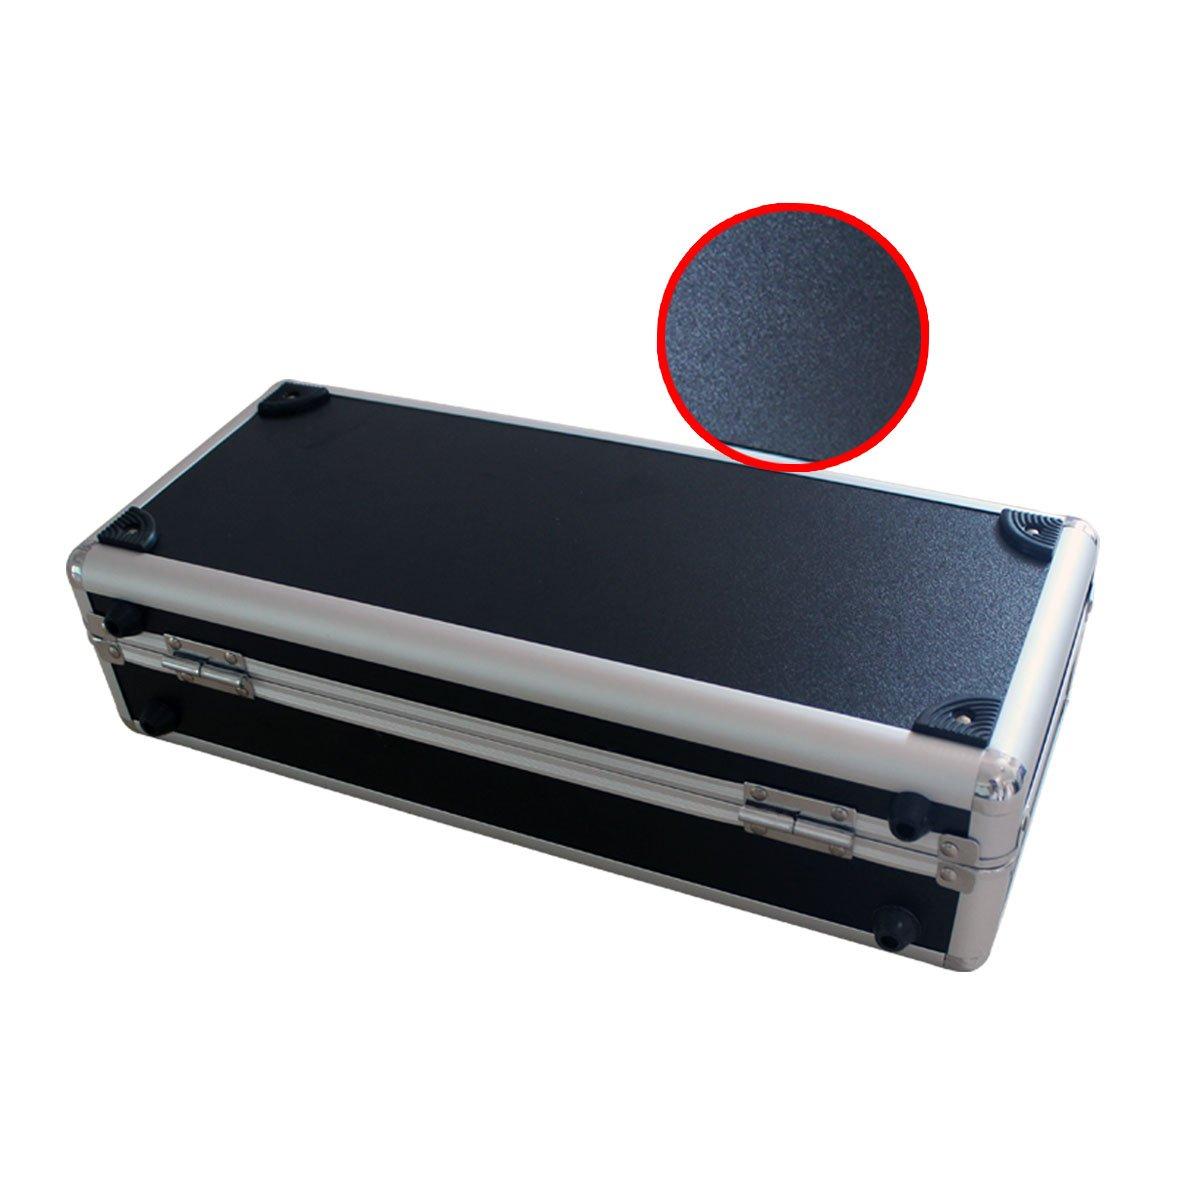 ENO EX QQ Case 5-Pedal Pedalboard/Electronic Guitar Effects Pedals Flight Case by Effects Pedals Flight Case (Image #3)